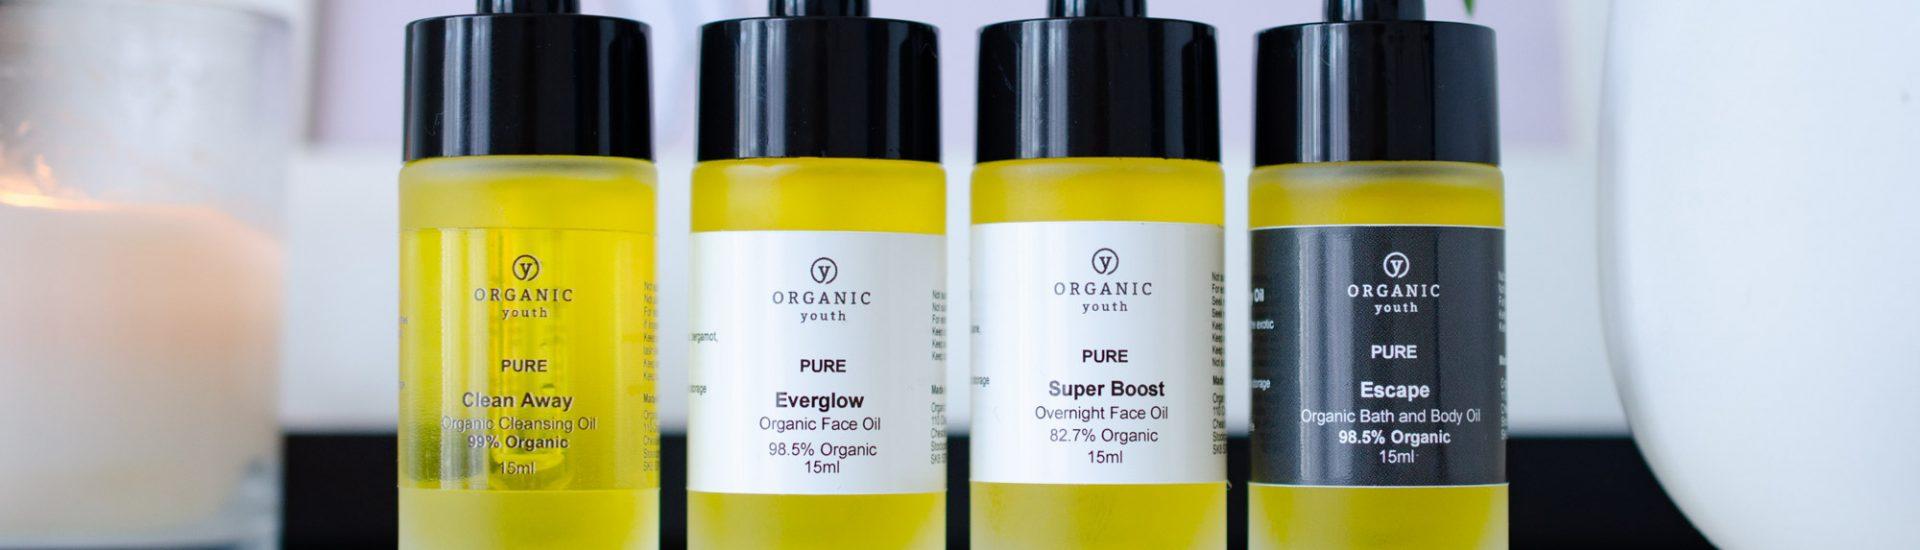 Organic Youth skincare minis